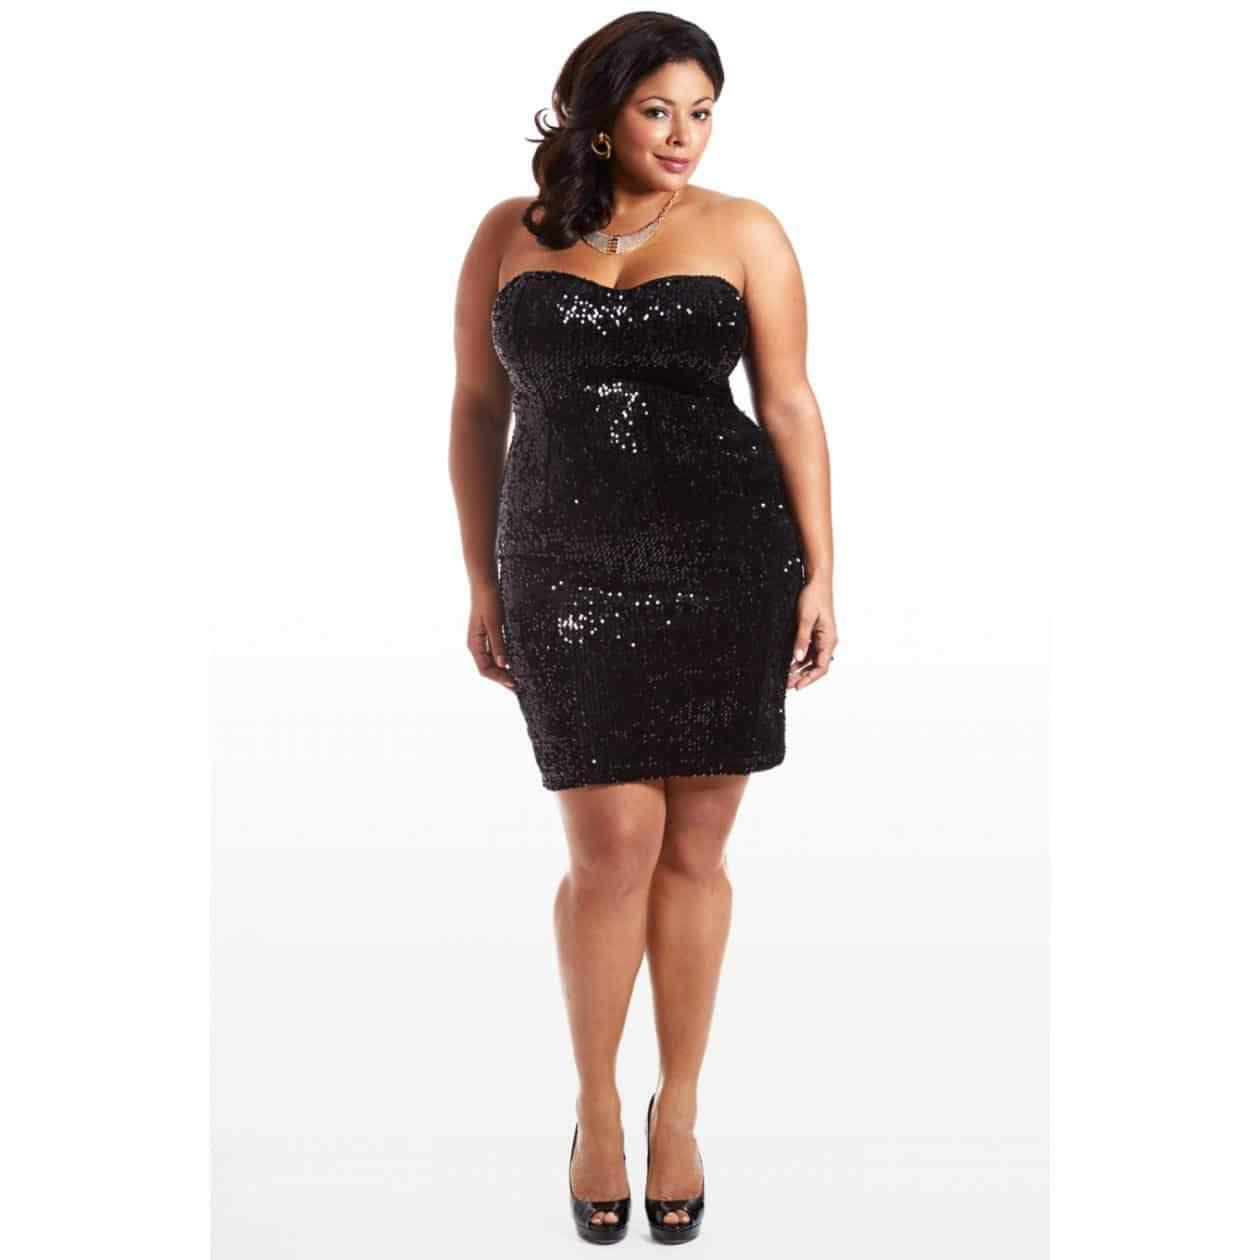 Fashion to Figure Plus Size Sequin Dress on The Curvy Fashionista